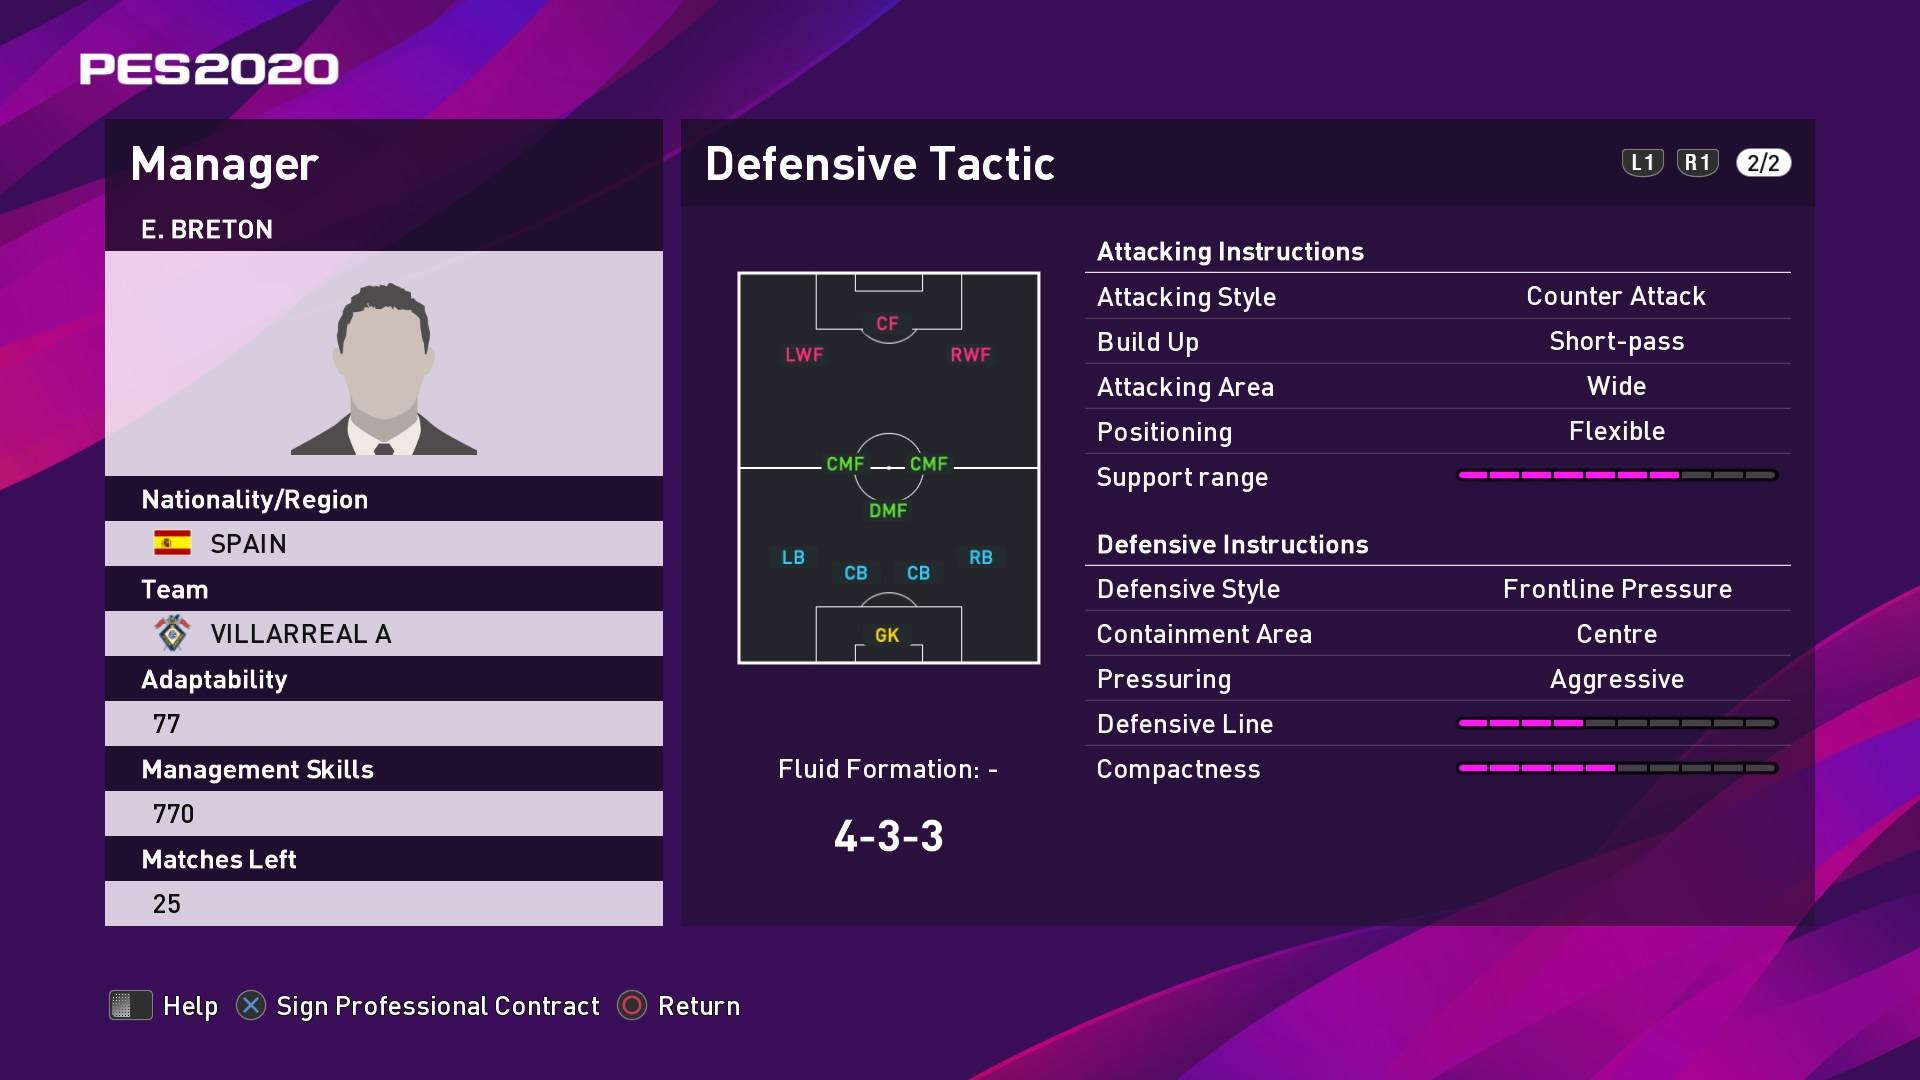 E. Breton (Javier Calleja) Defensive Tactic in PES 2020 myClub